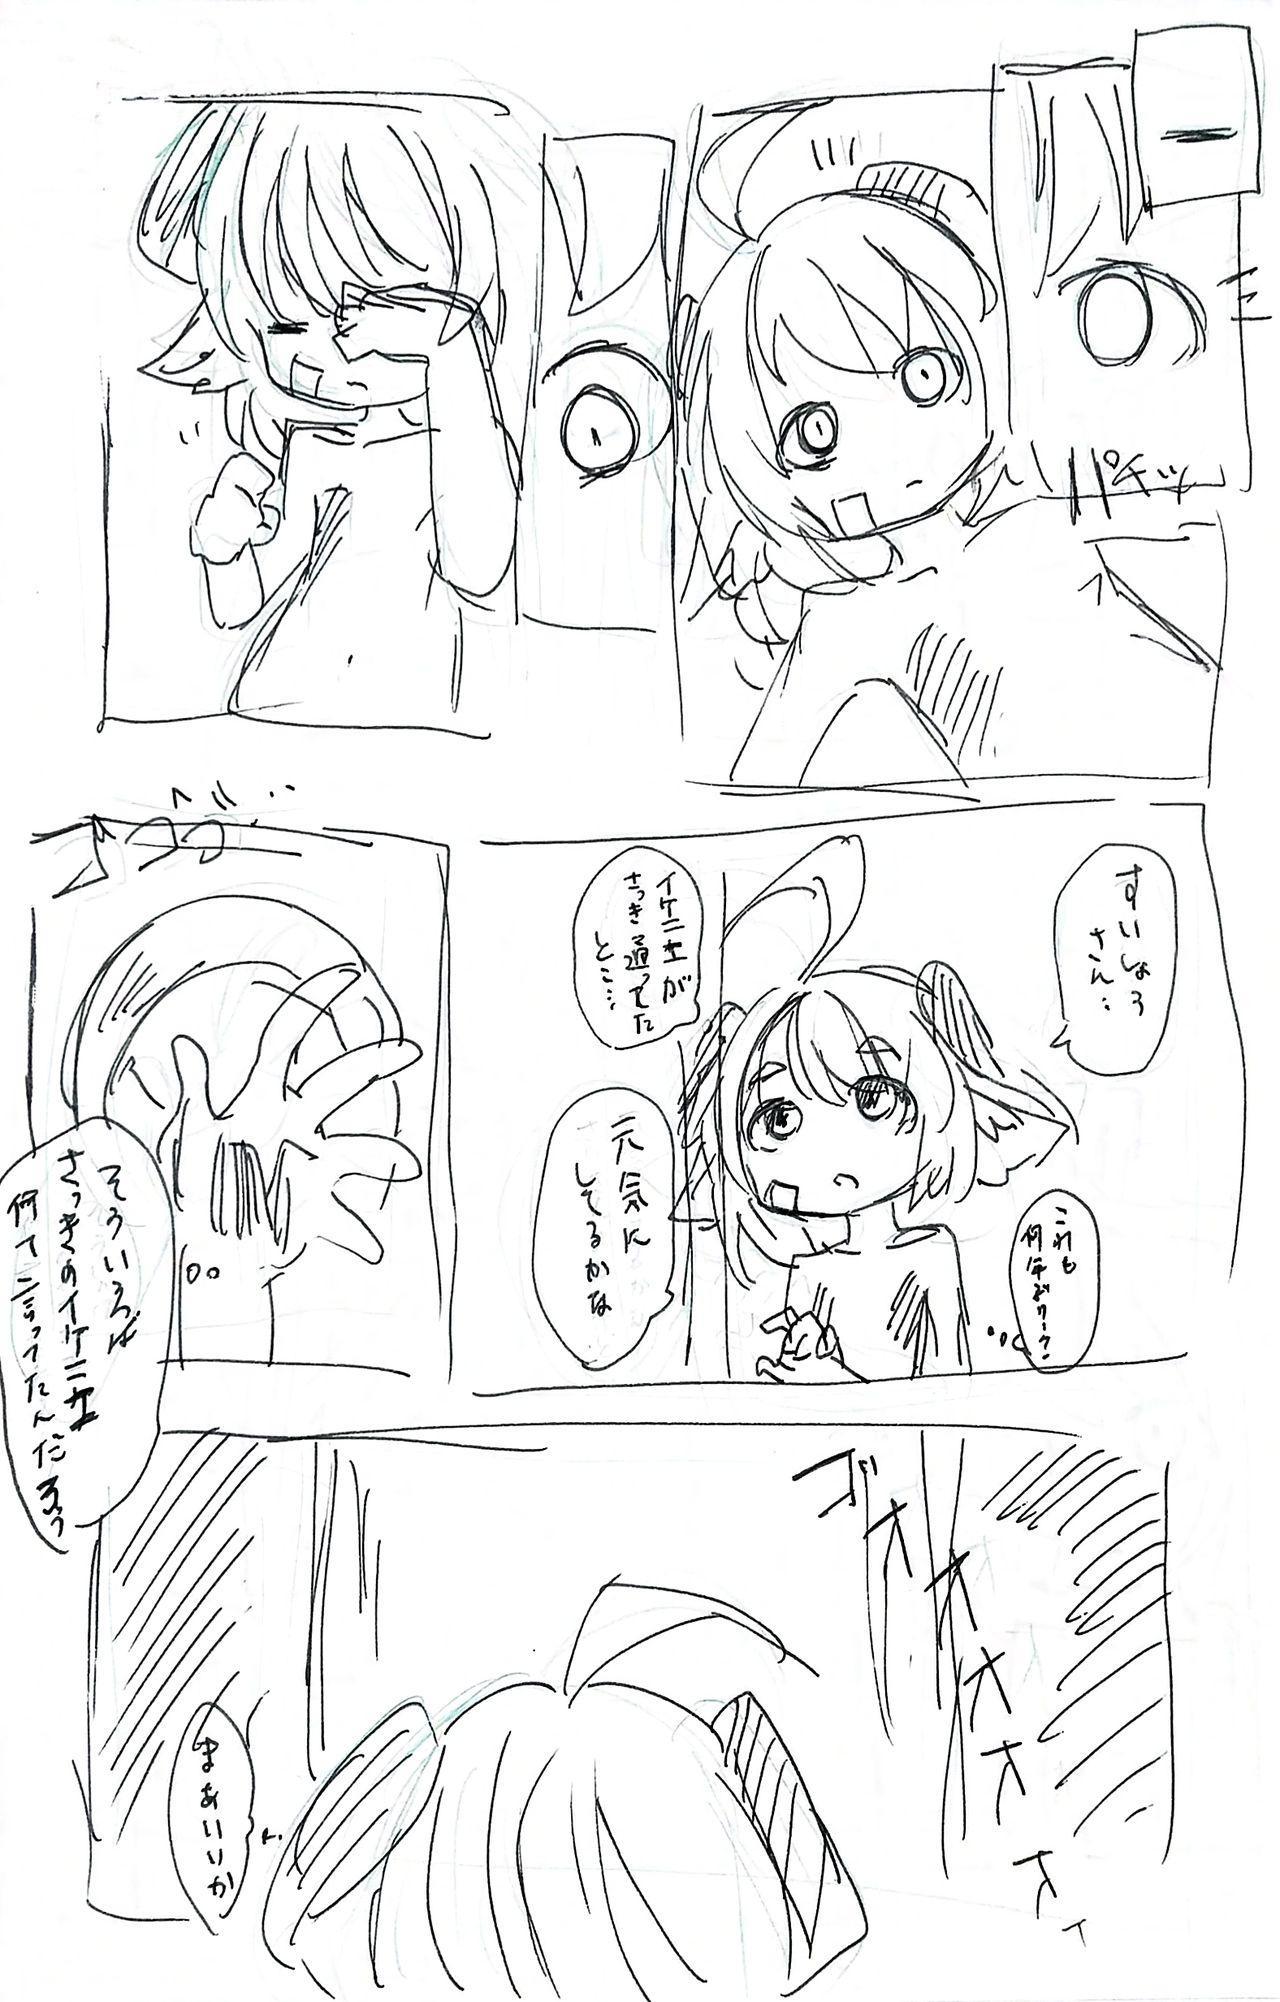 Hisui-chan carnival biyori 11